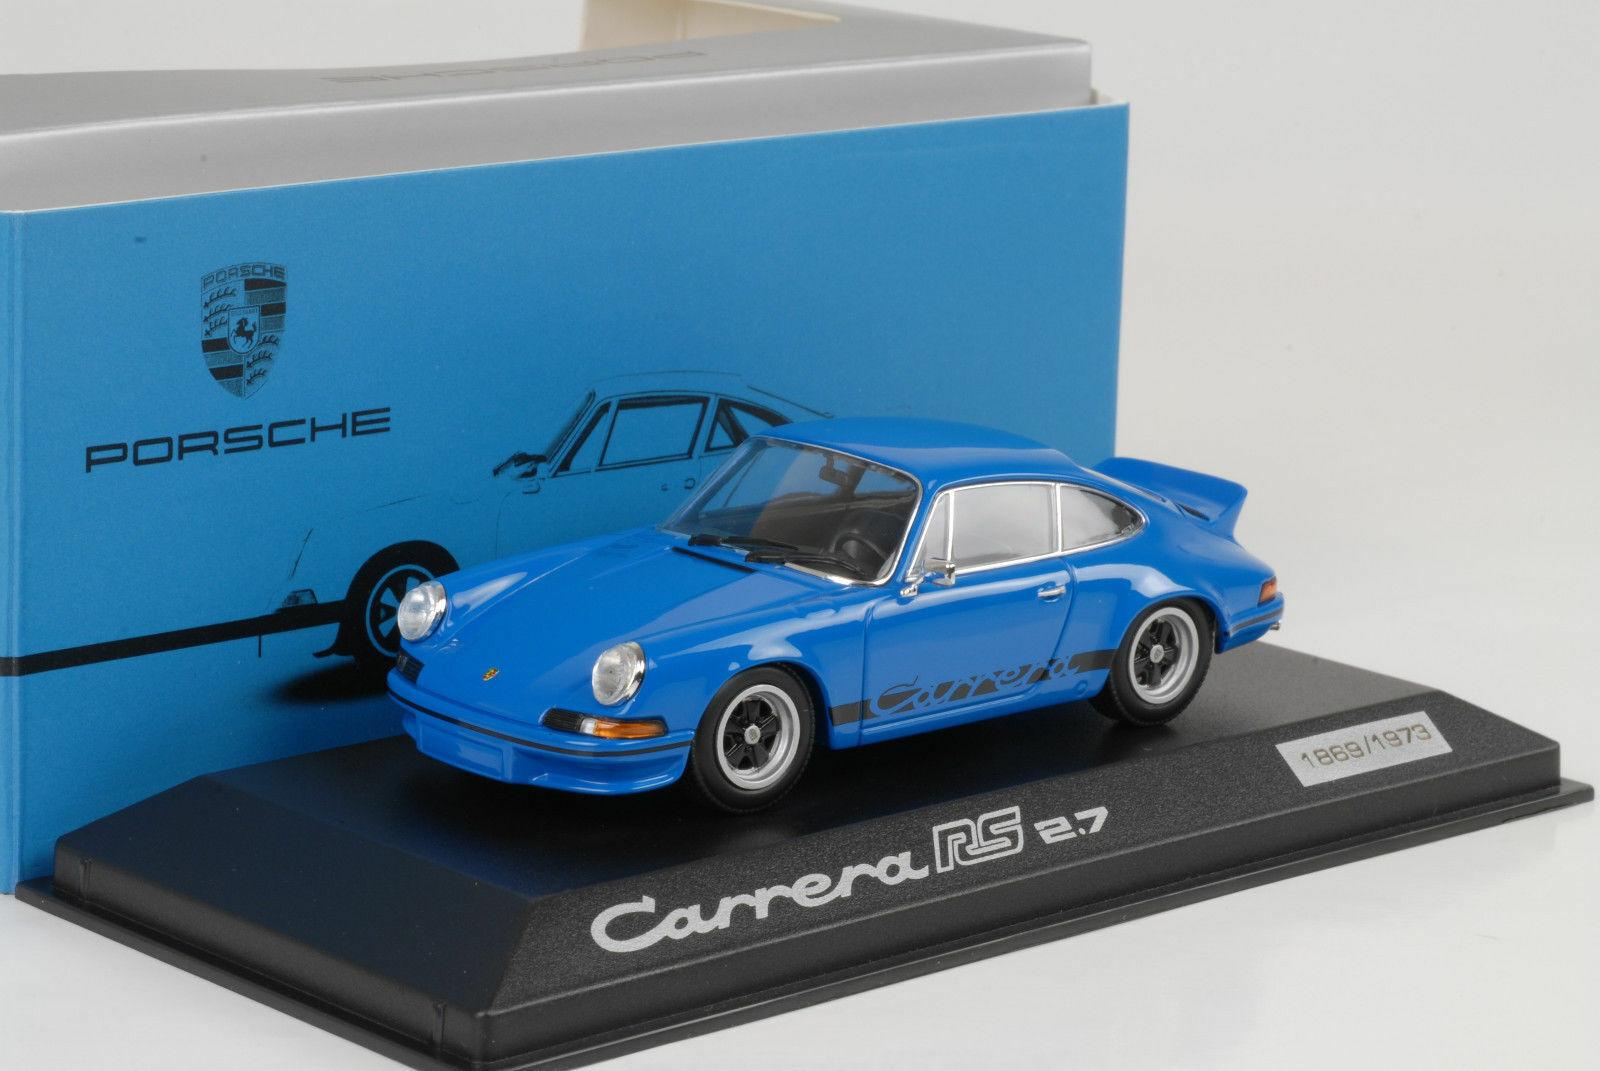 1973 Porsche 911 Carrera Rs 2.7 Blu Stripes Nero 1 43 Minichamps Wap